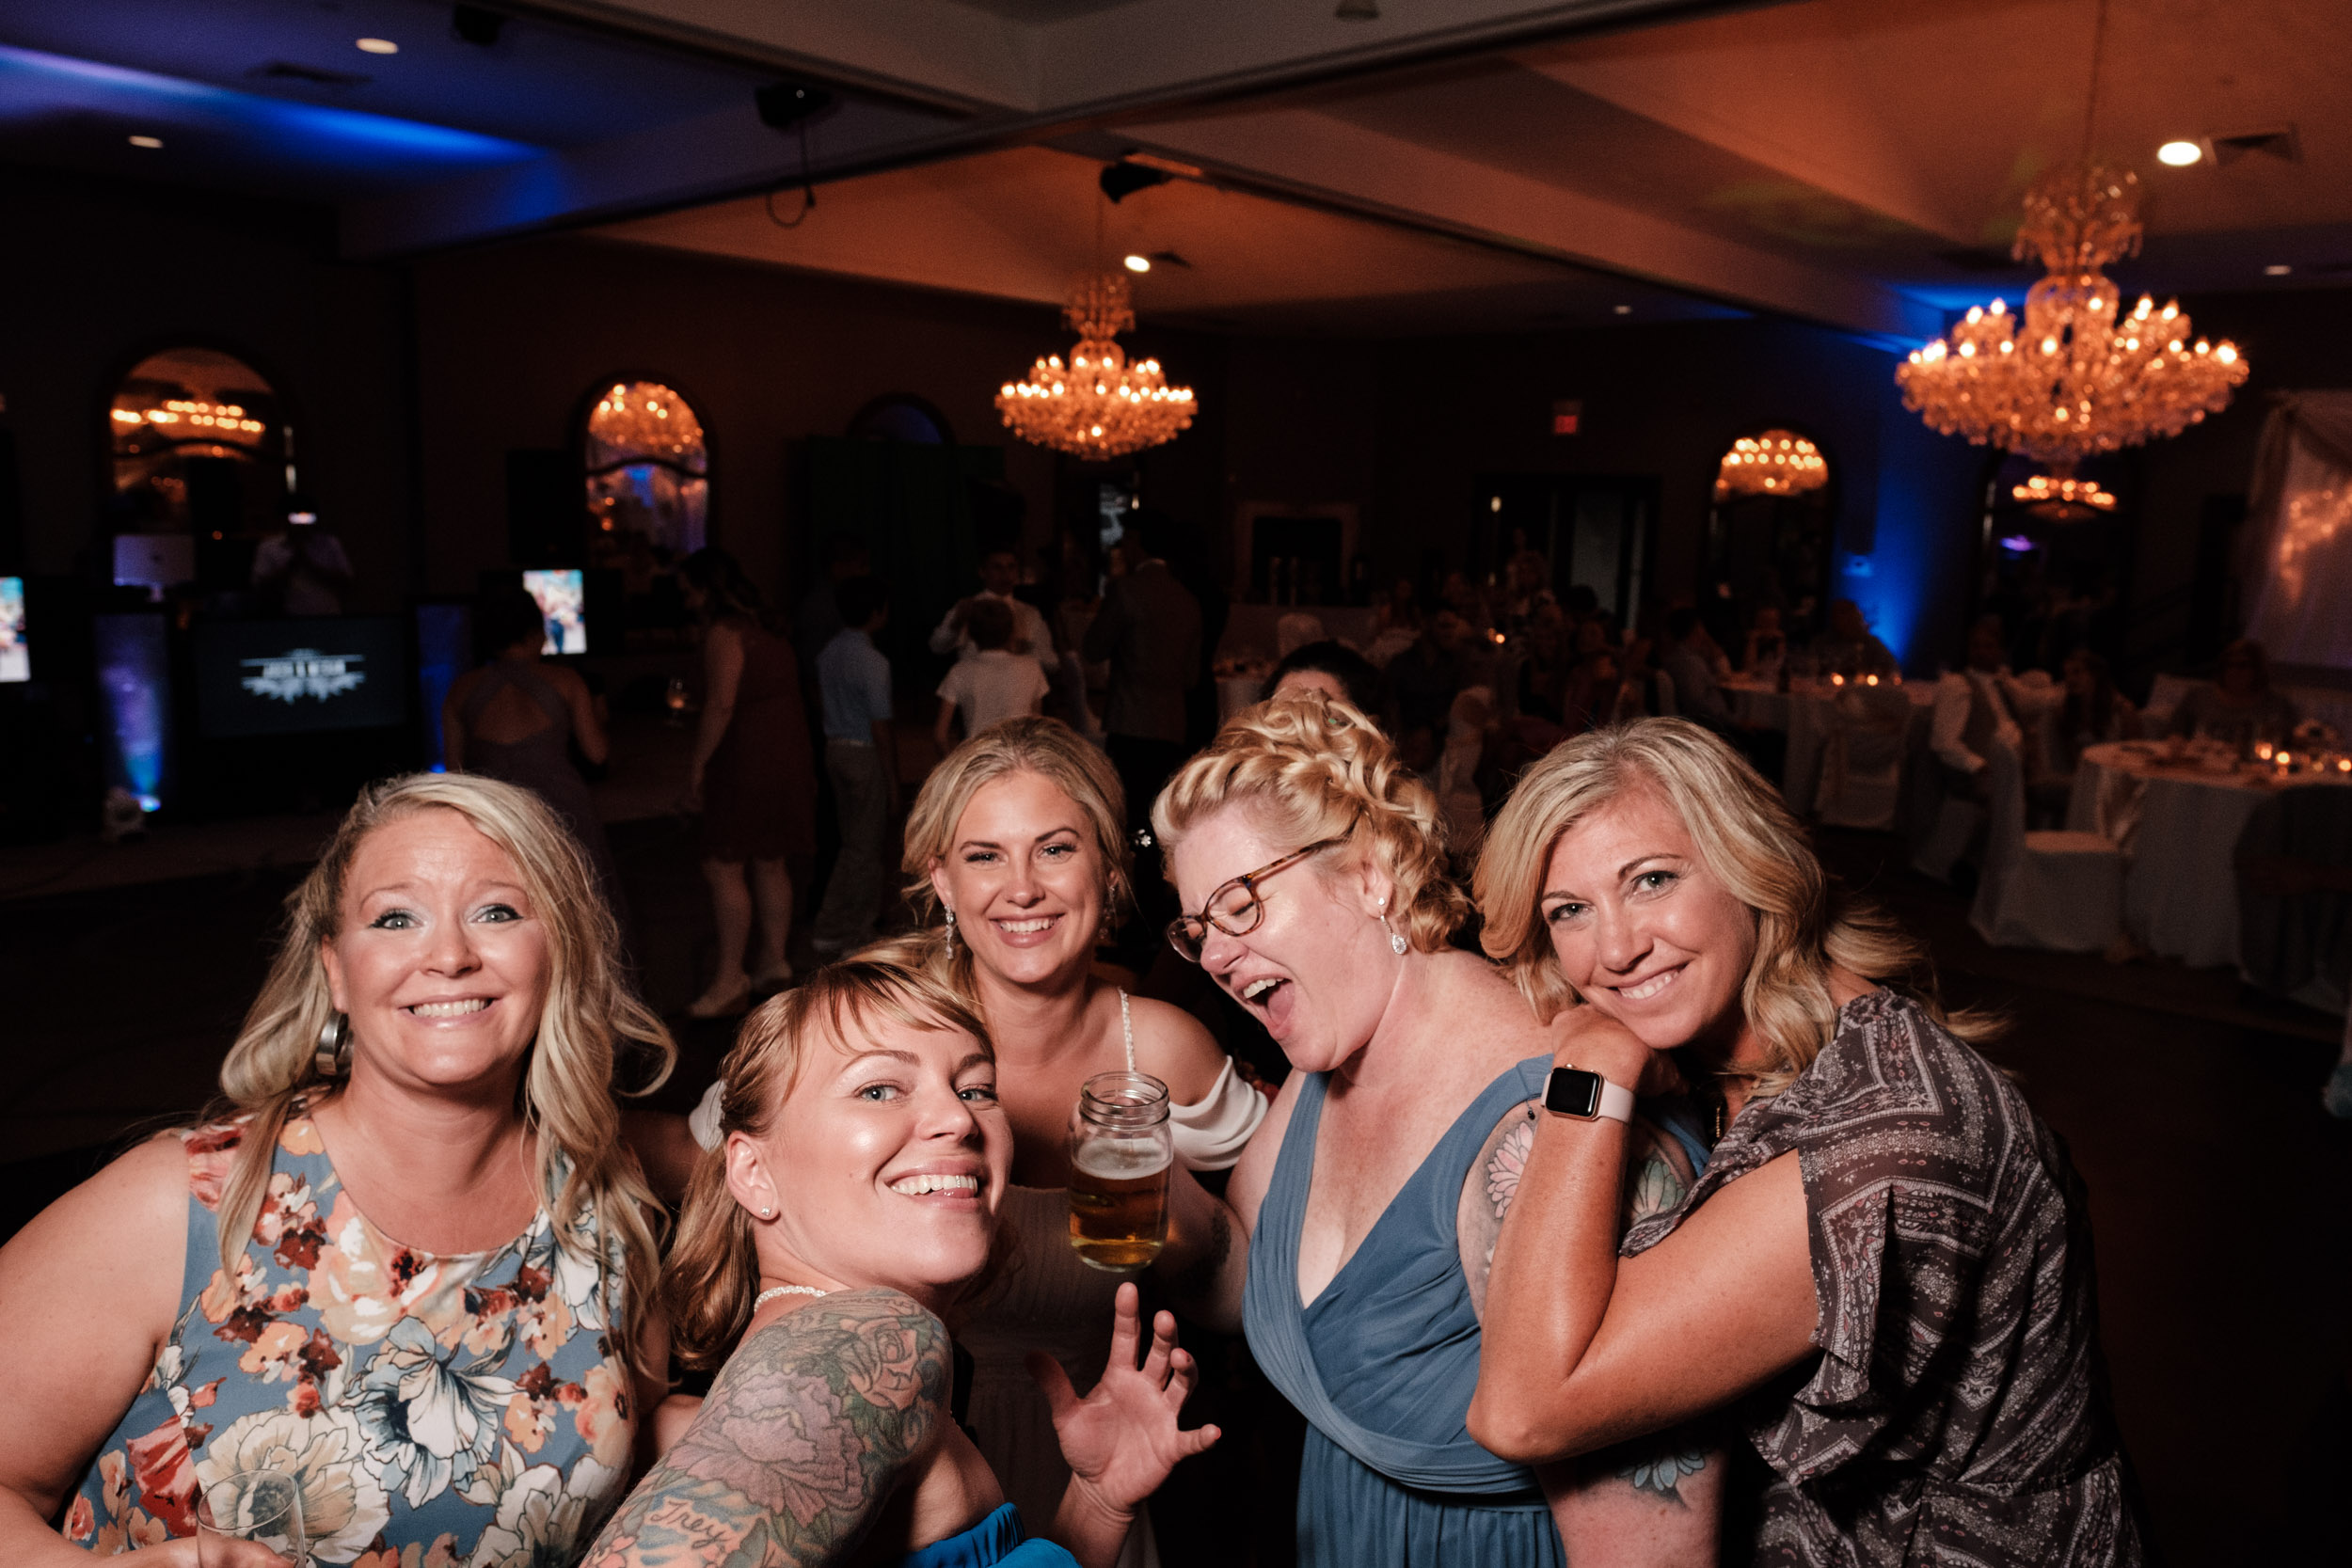 19-06-01 Megan Josh - Nicholas Conservatory Wedding-75.jpg